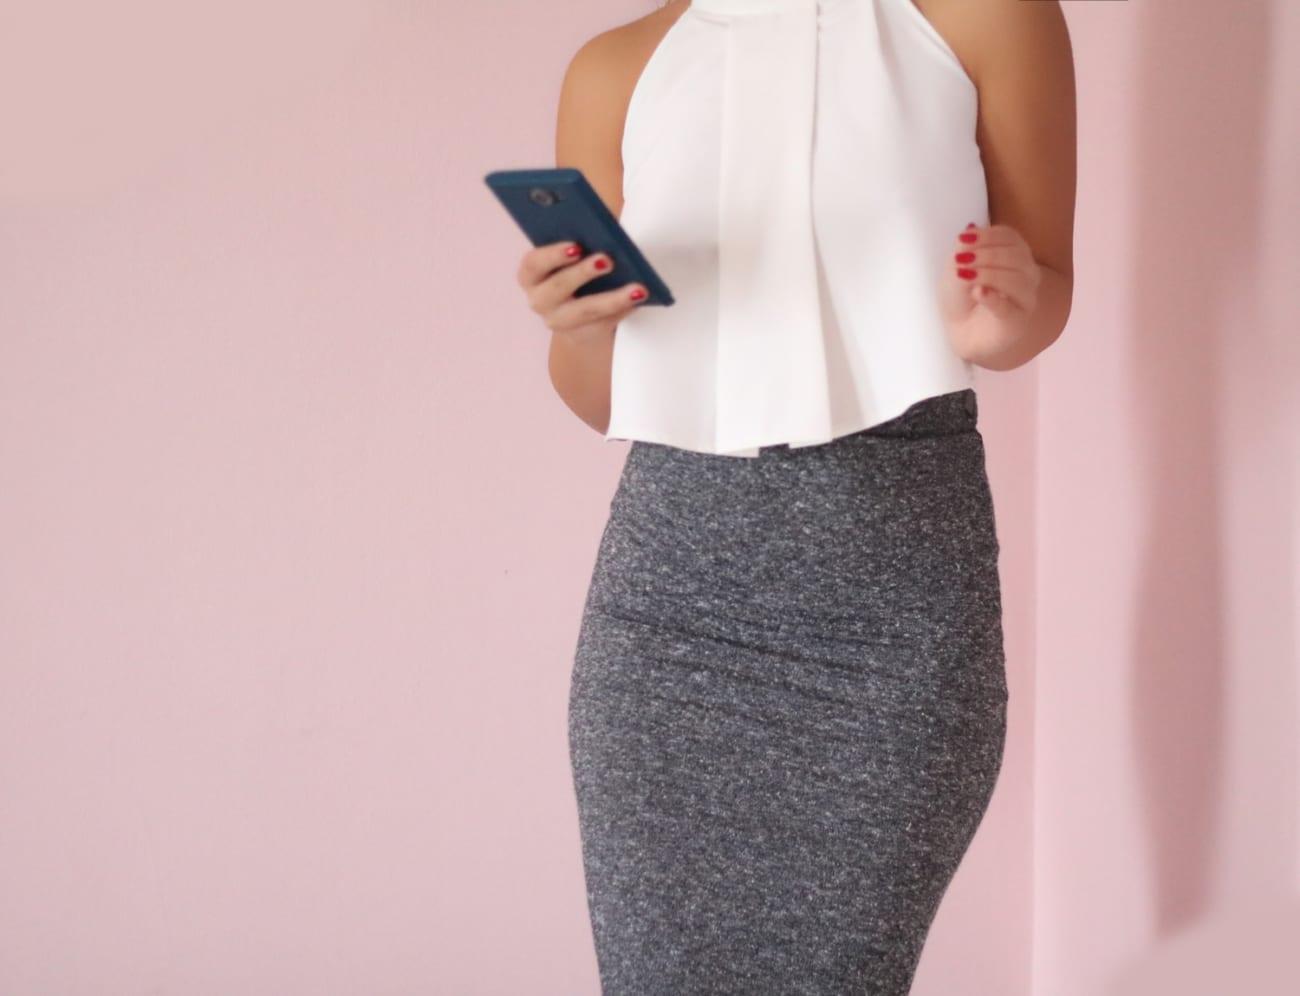 flared-top-evazat-larg-alb-white-topfashion-pareri-tinuta-business-casual-smart-idei-birou-roxi-rose-blogger-fashion-3